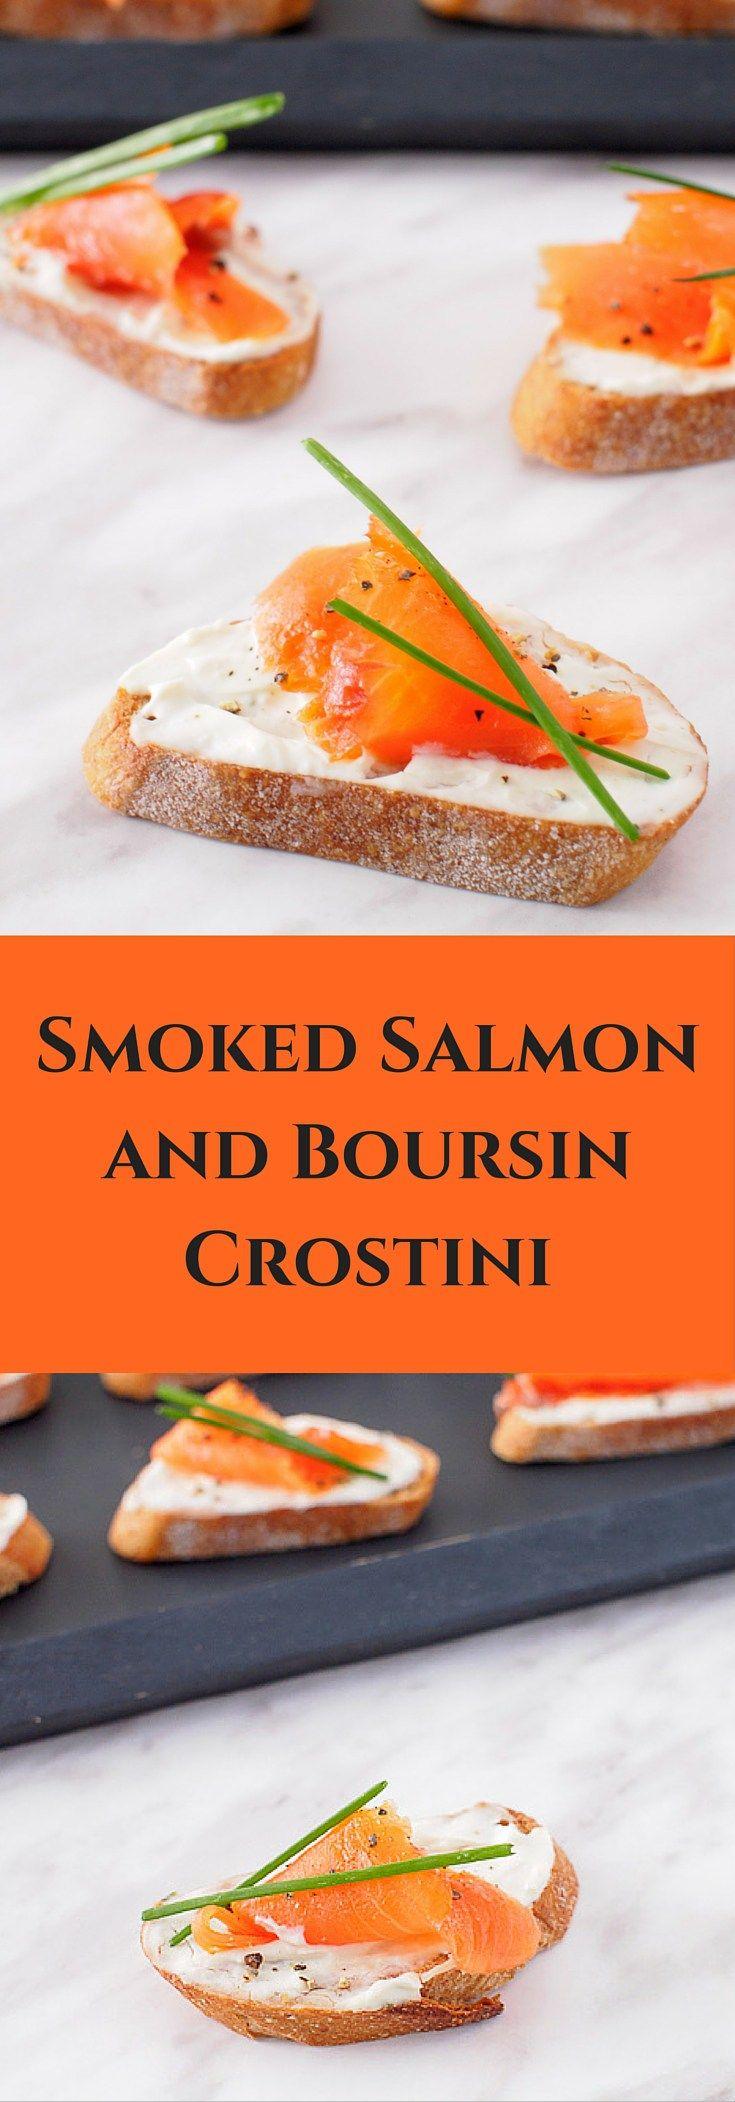 Smoked Salmon and Boursin Crostini                                                                                                                                                                                 More